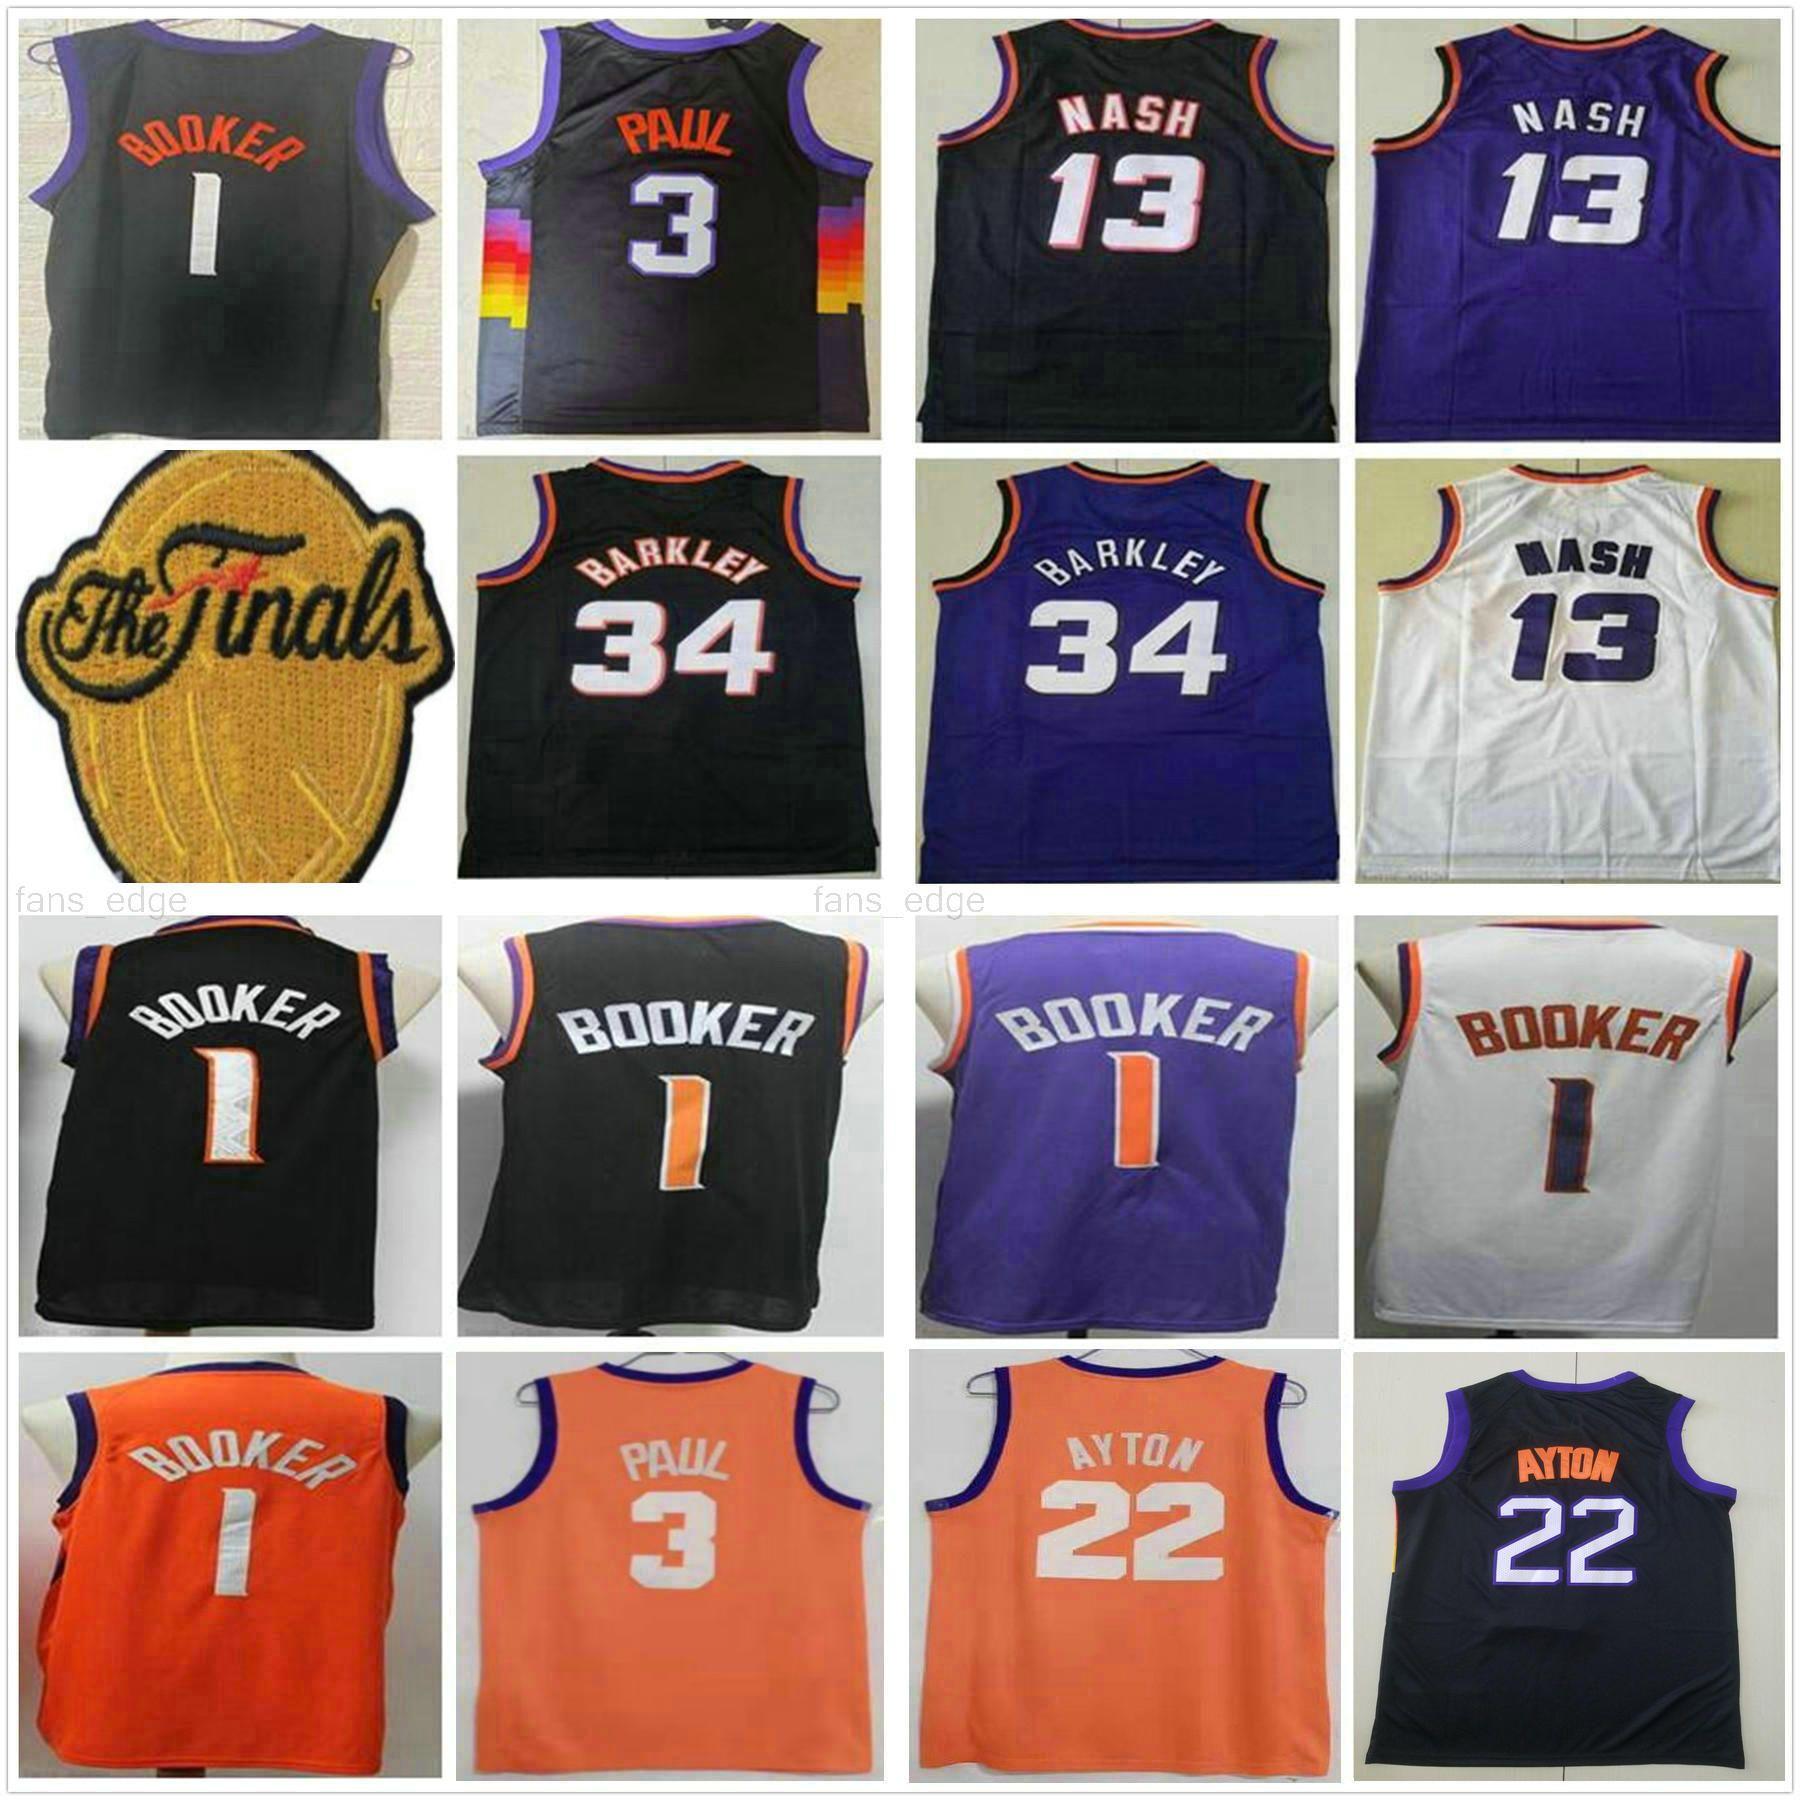 2021 Finaller Yama Devin 1 Booker Chris 3 Paul Basketbol Formaları DeAndre 22 Ayton Retro Charles 34 Barkley Steve 13 Nash Mor Siyah Beyaz Gömlek